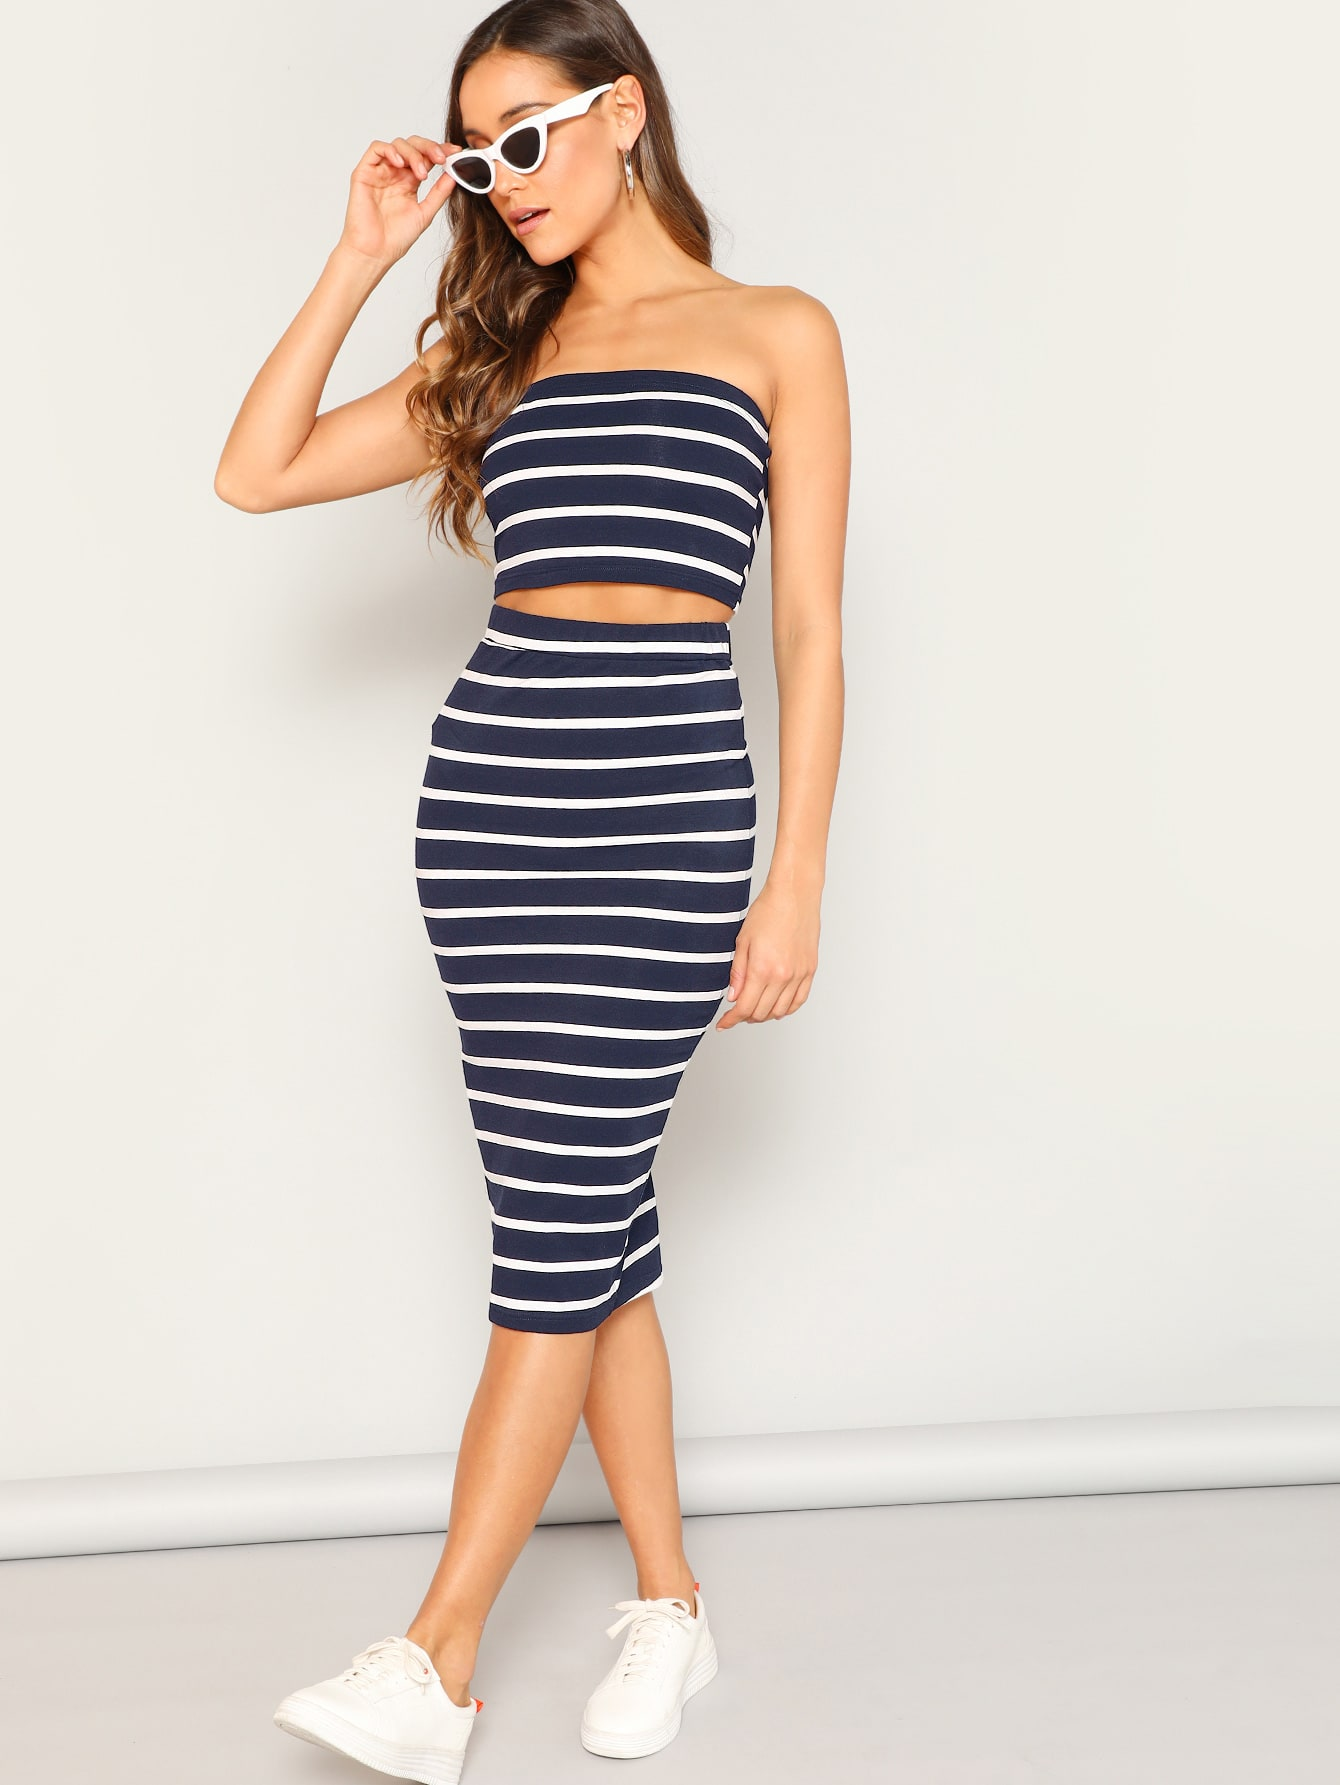 Фото - Бандо в полоску и полосатая юбка с разрезом от SheIn цвет темно синий